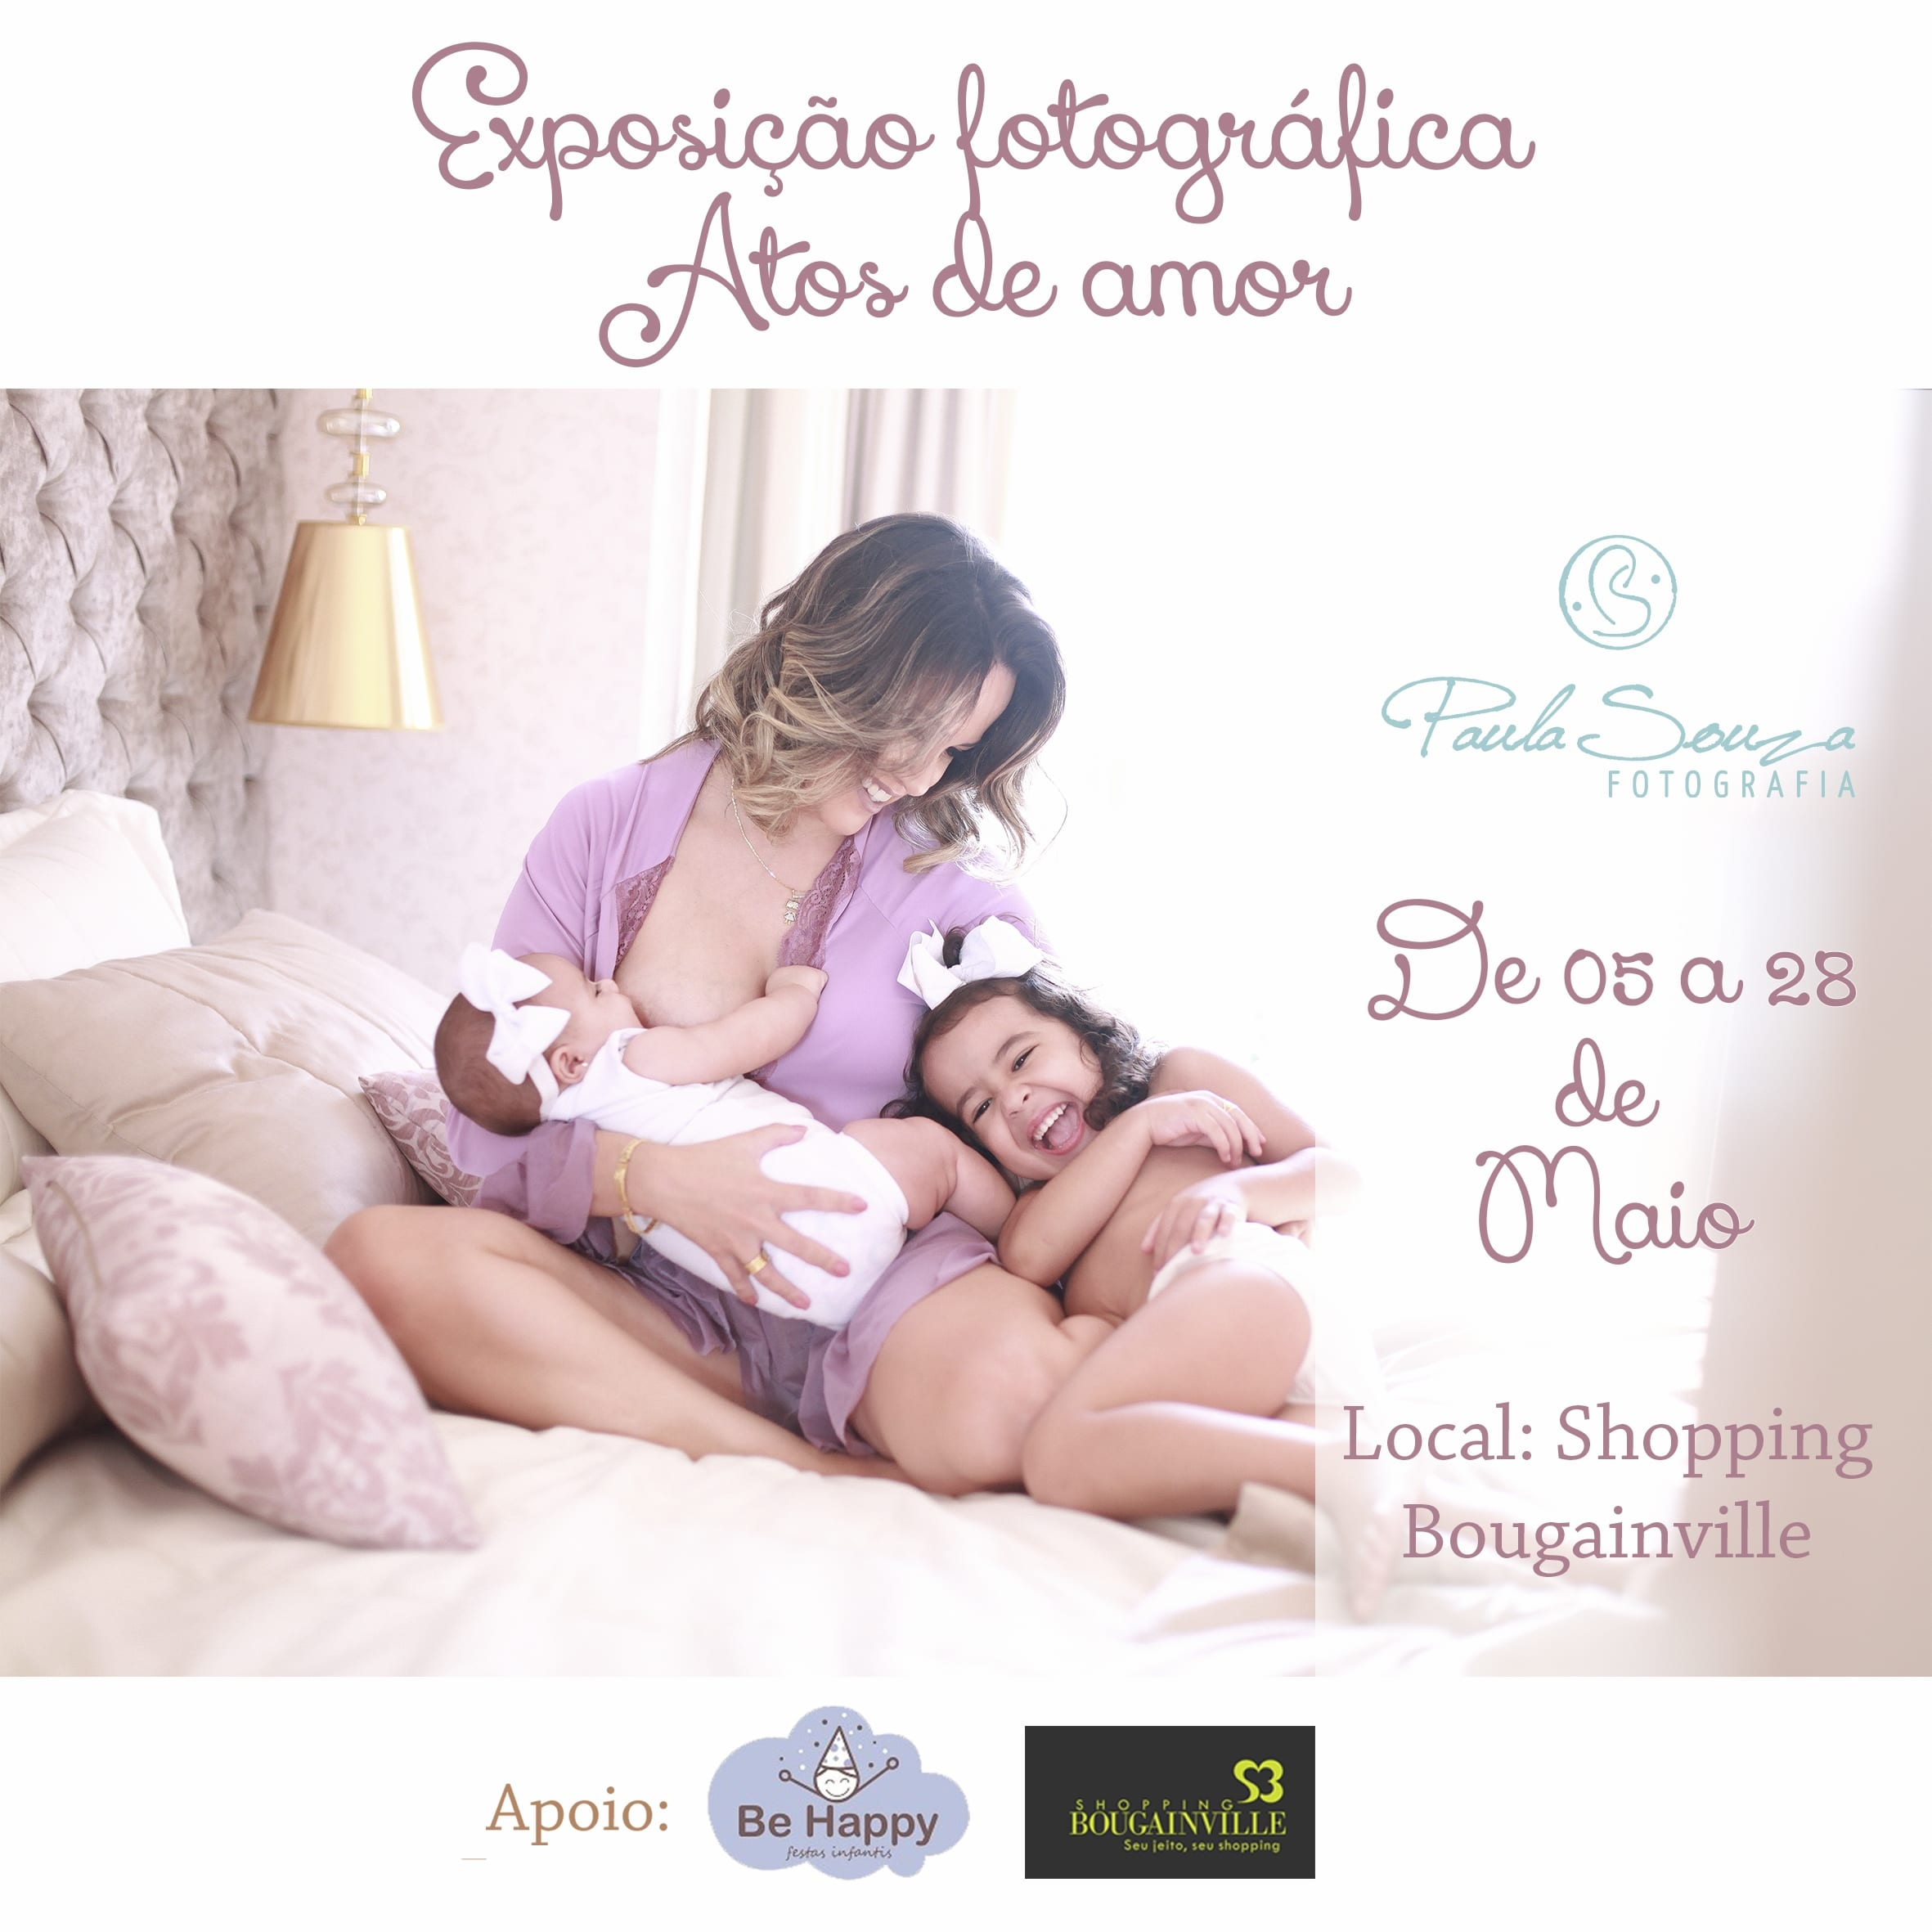 exposicao atos de amor, paula souza fotografia, newborn, gestante, goiania, goias, anapolis, brasilia, bougainville, shopping 1